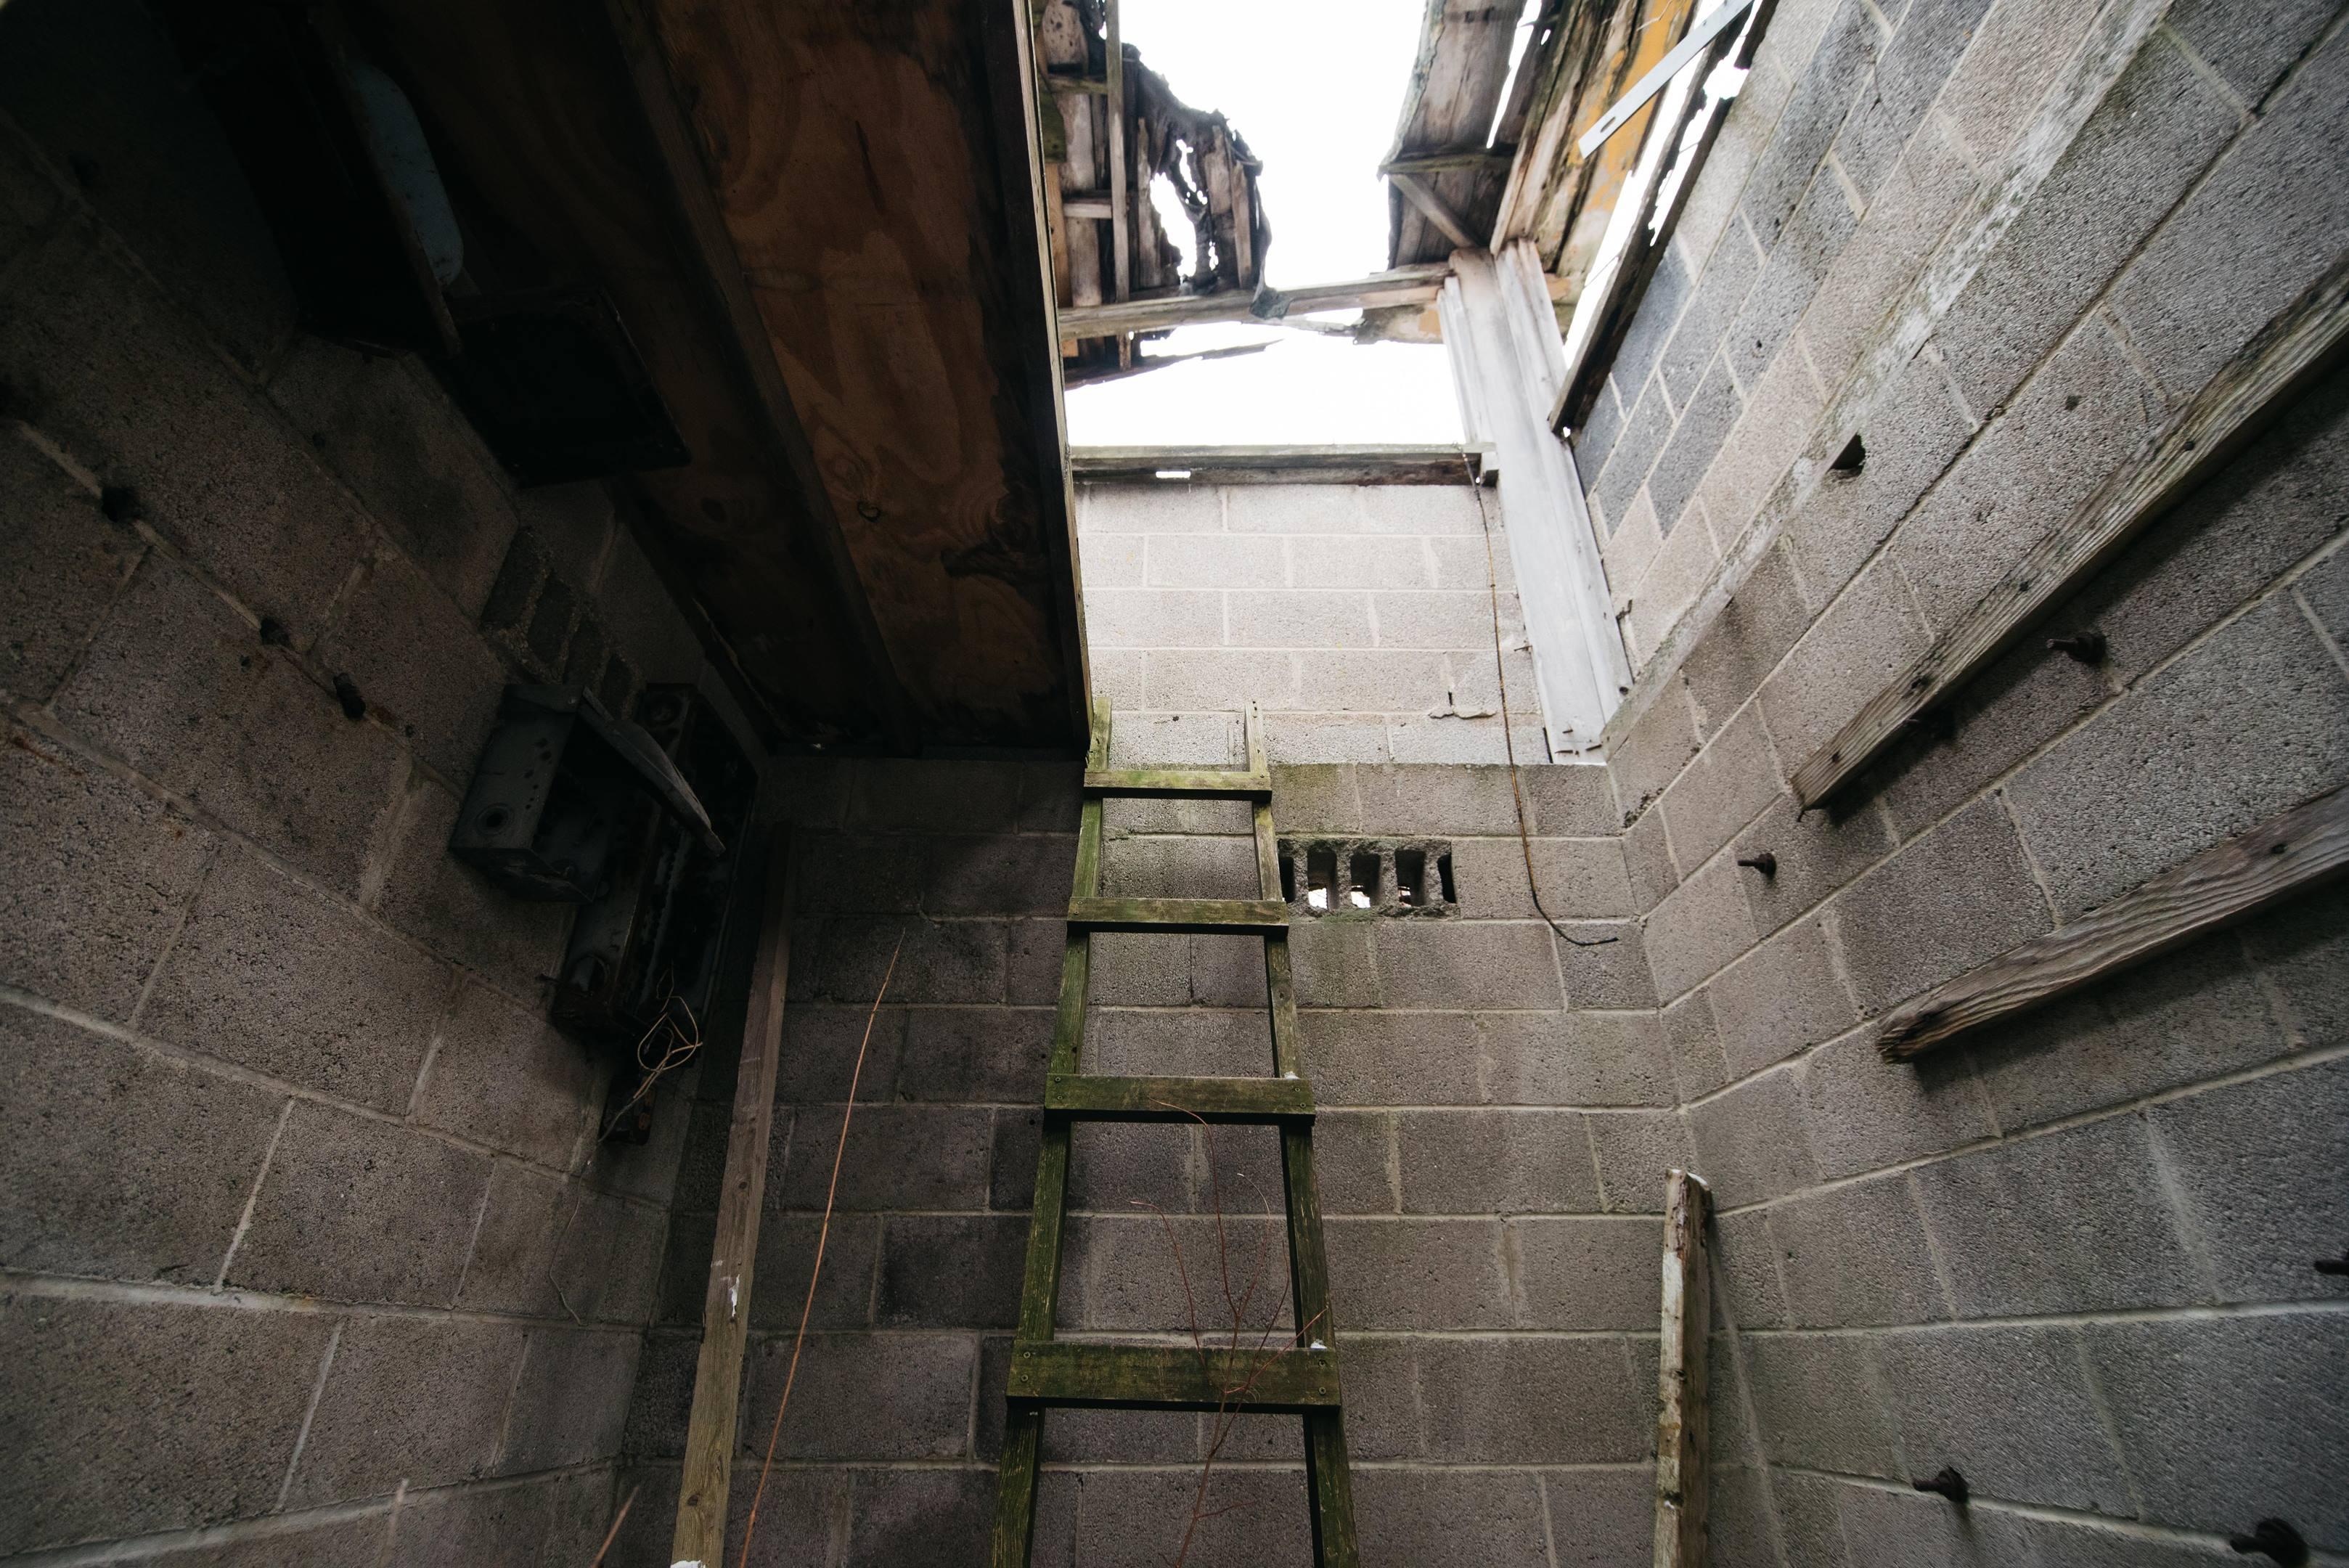 Motor City Dragway inside tower ladder